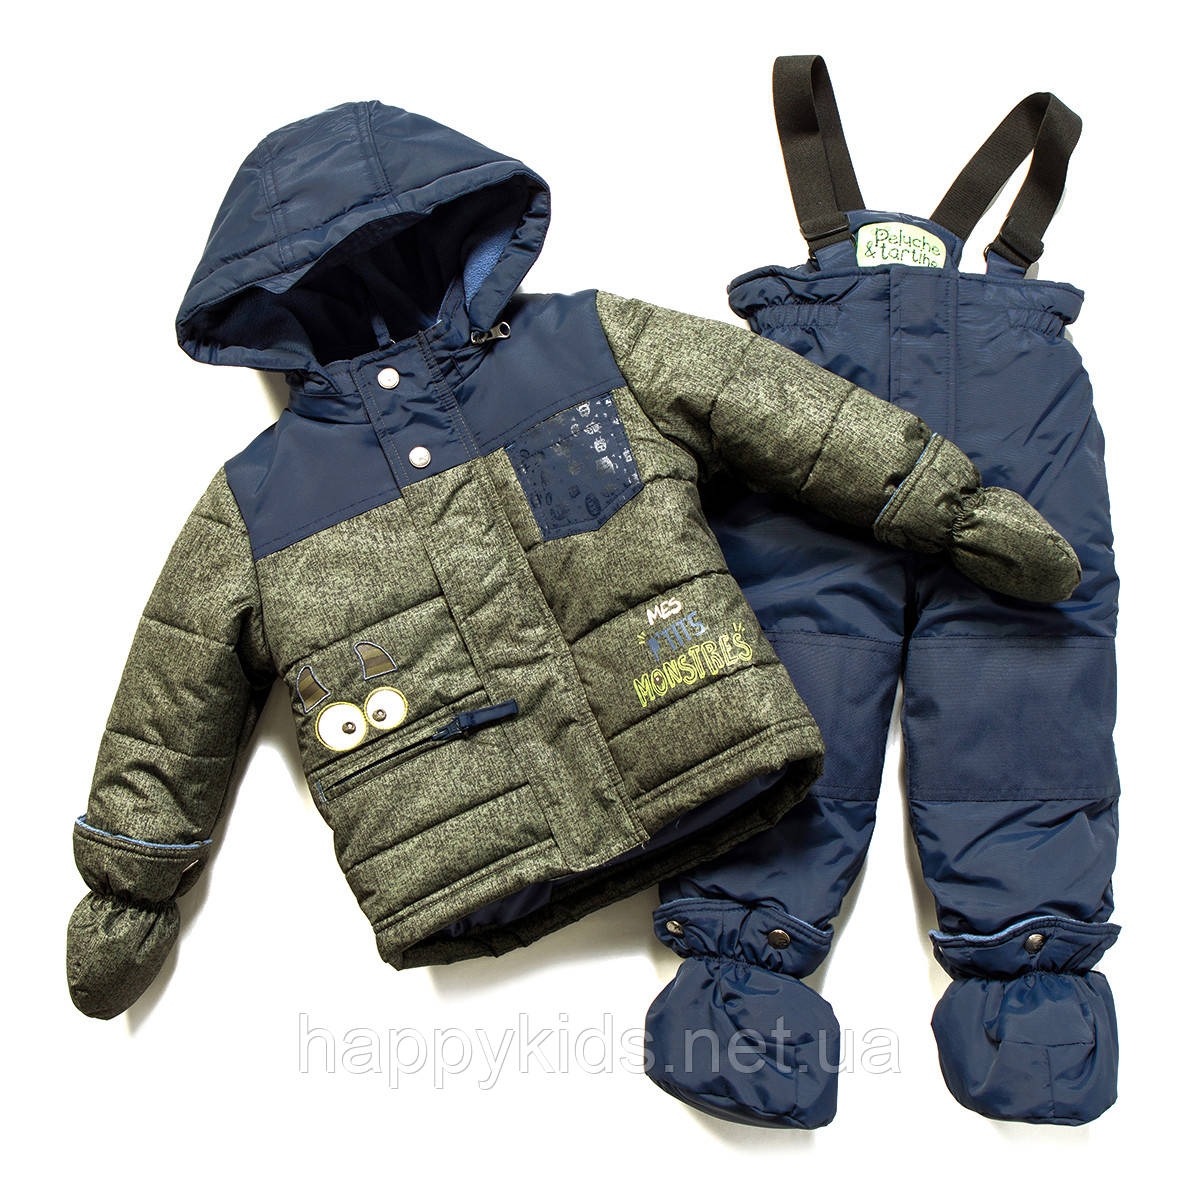 Зимний костюм для мальчика PELUCHE F17 M 03 BG Dk Heaven. Размеры 75-97.